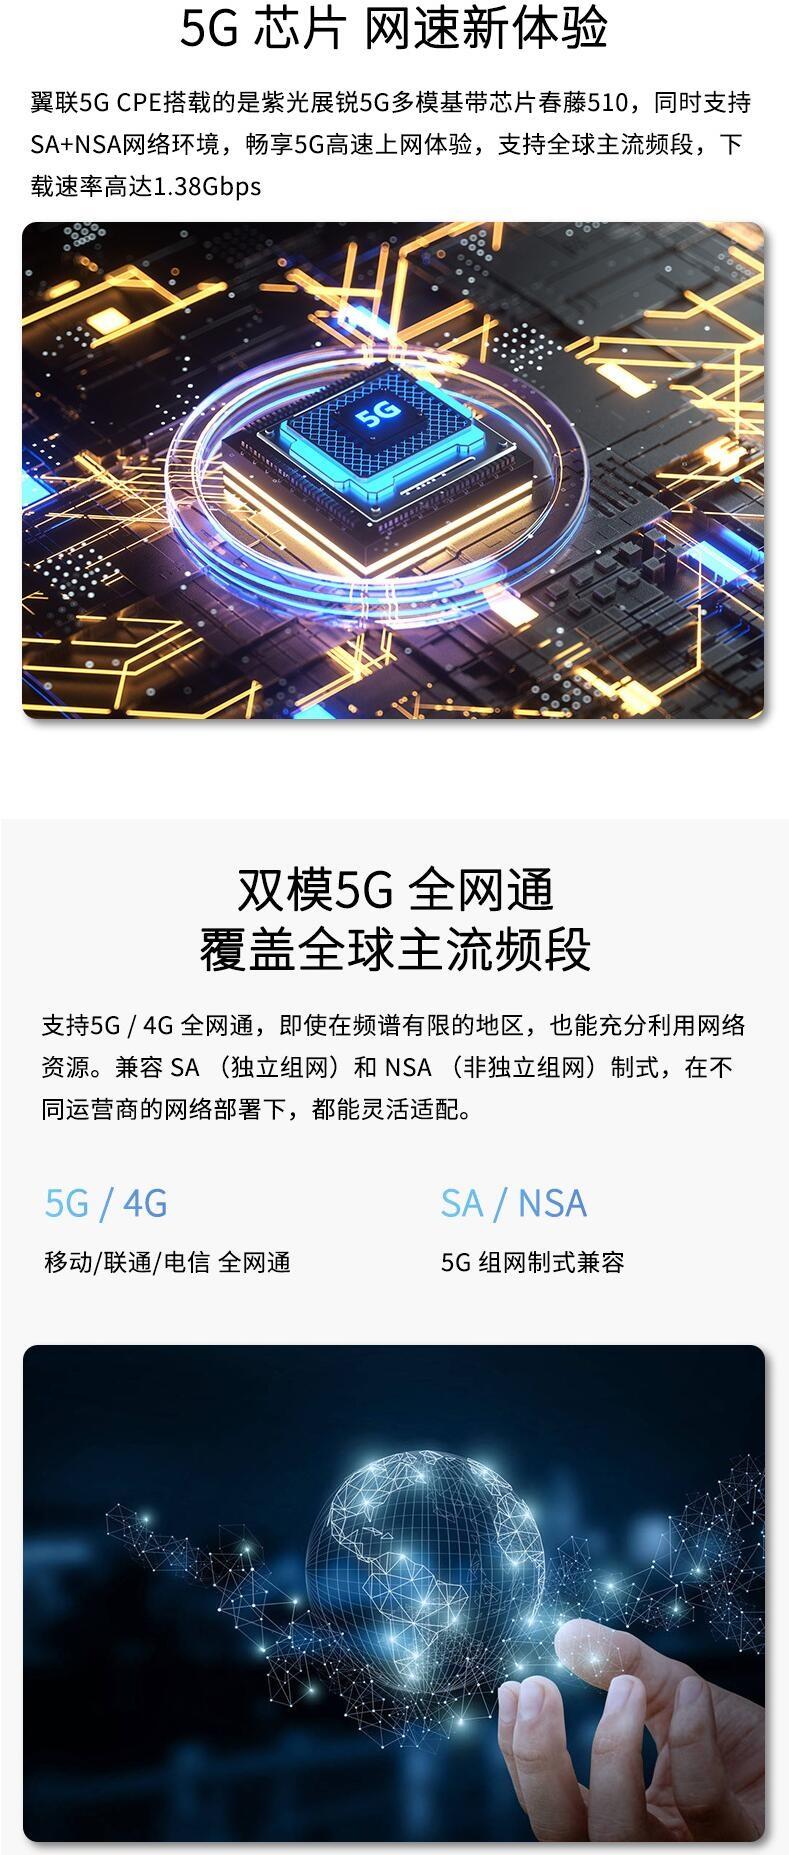 5G和Wi-Fi6合二为一 翼联5G CPE重新定义智能路由器